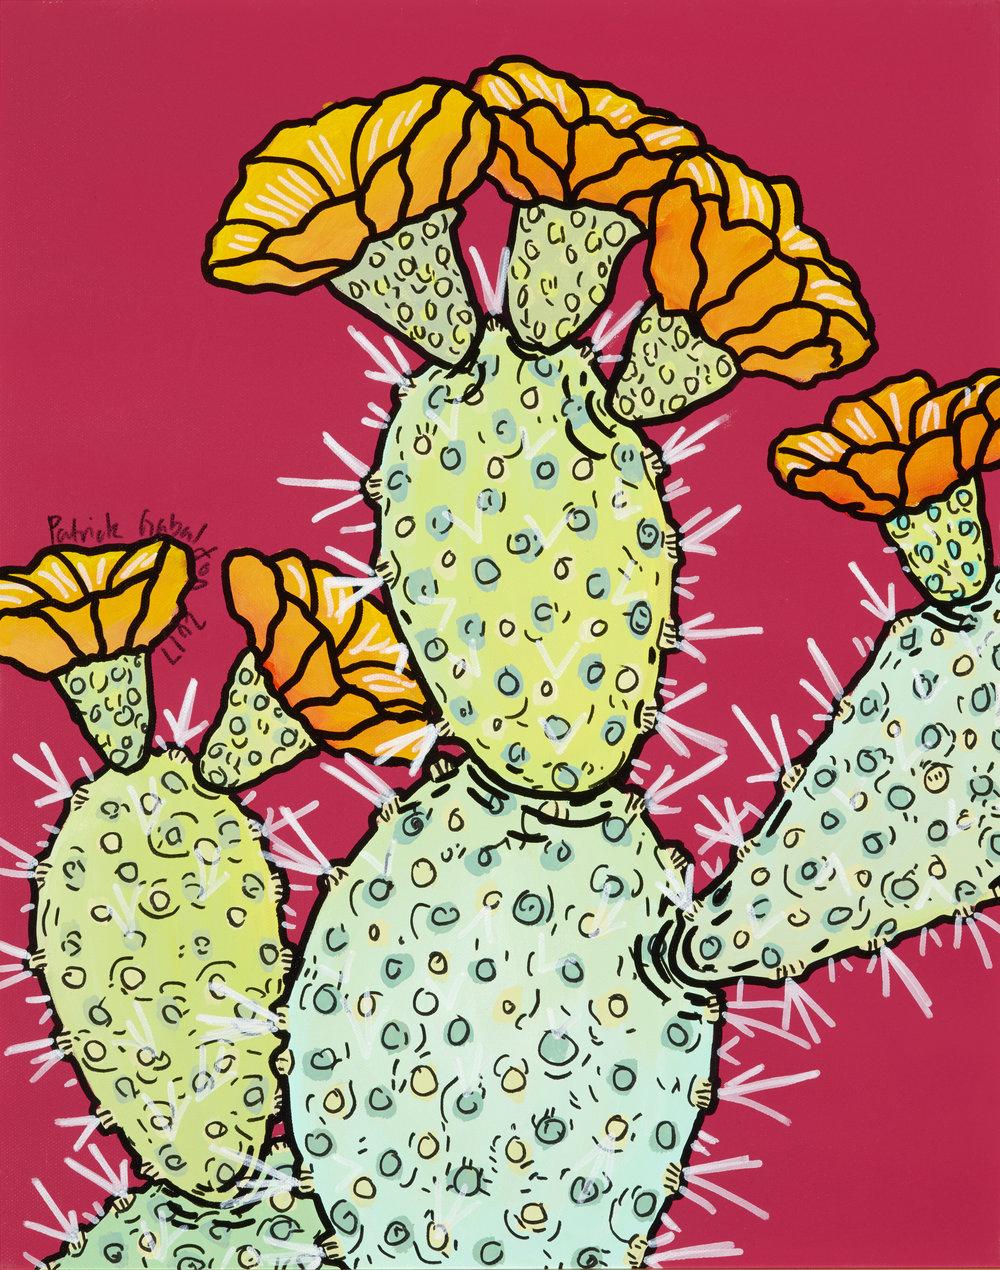 Prickly_11.jpg